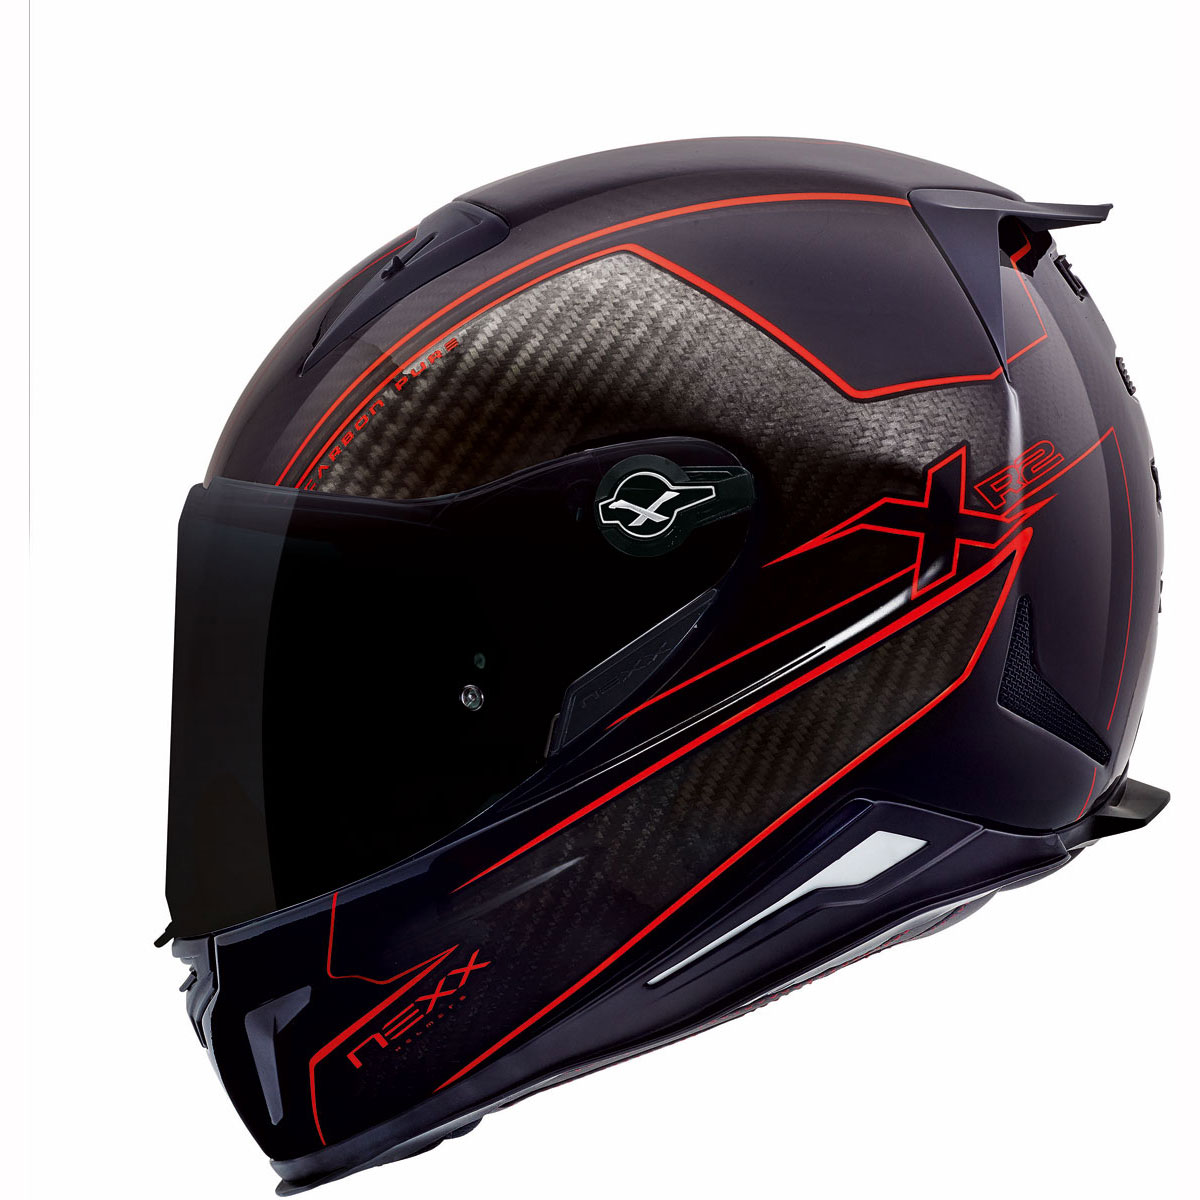 Nexx XR2 Carbon Motorcycle Helmet